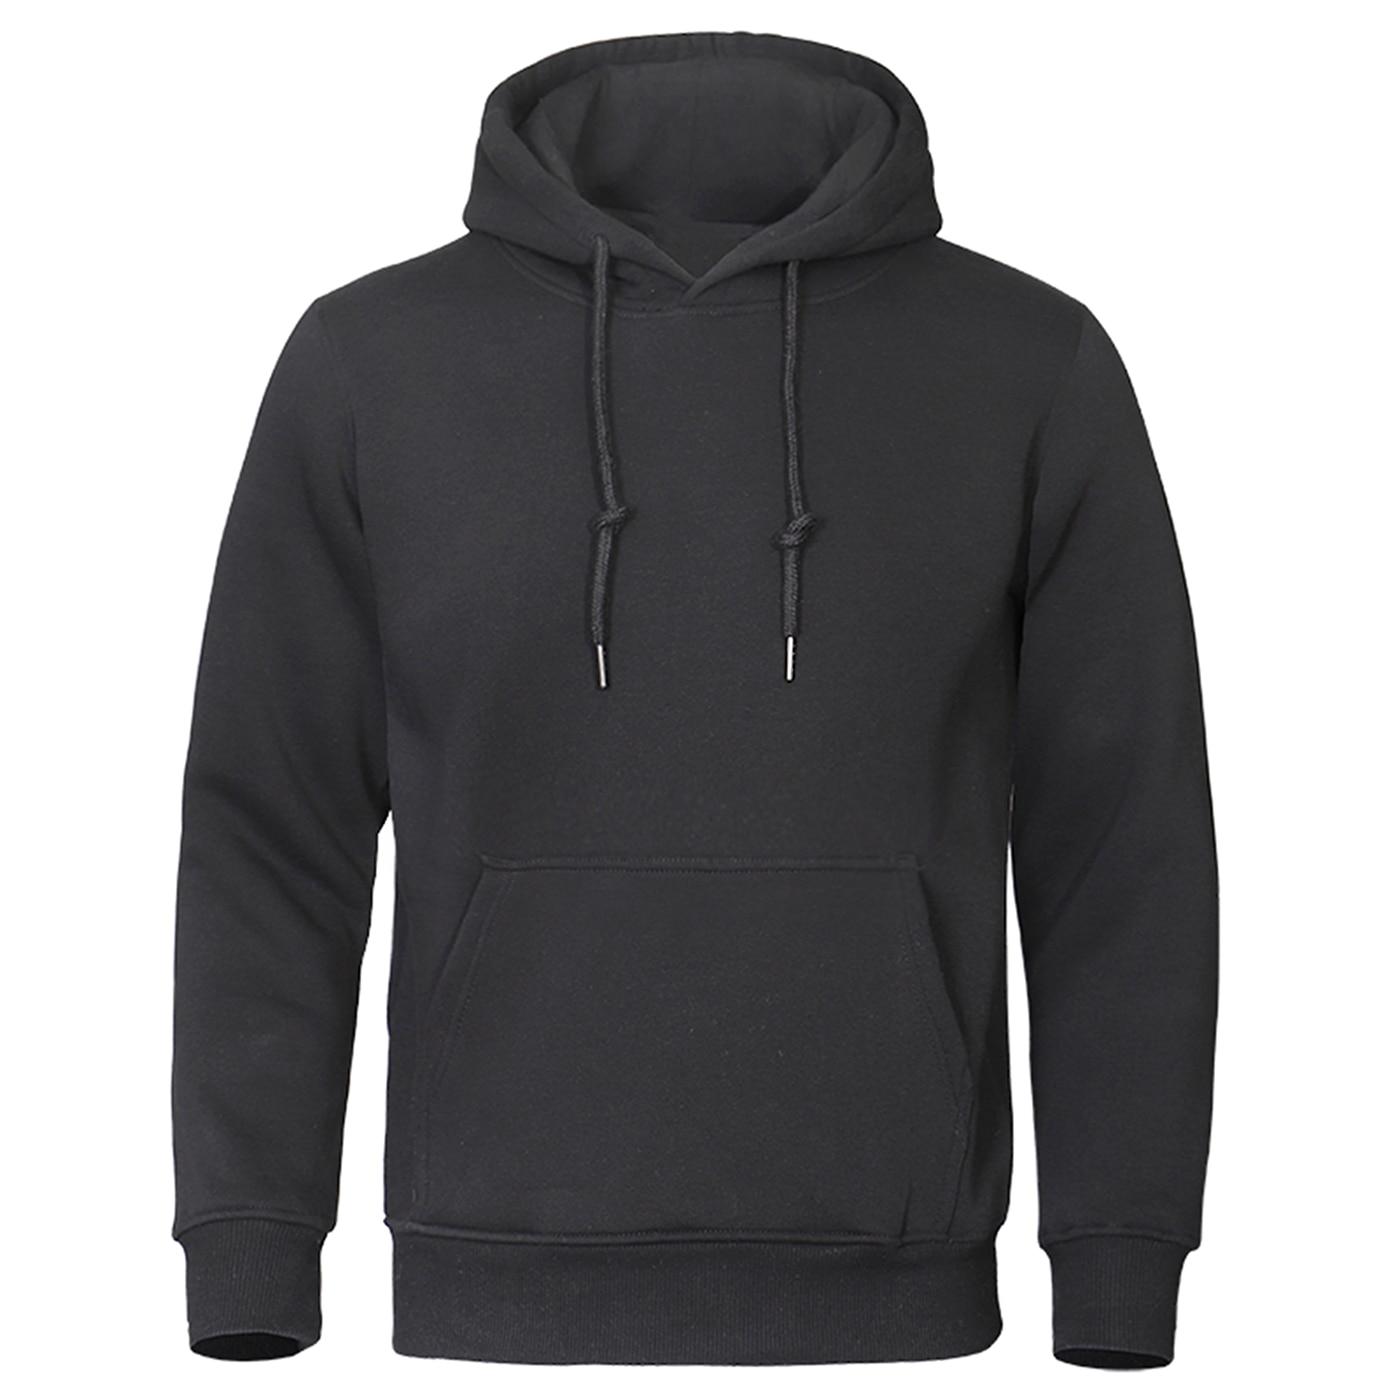 2019 Autumn Winter Men Hoodies Fleece Warm Mens Sweatshirt Fashion Streetwear Casual Men's High Quality Pullovers Brand Hoody